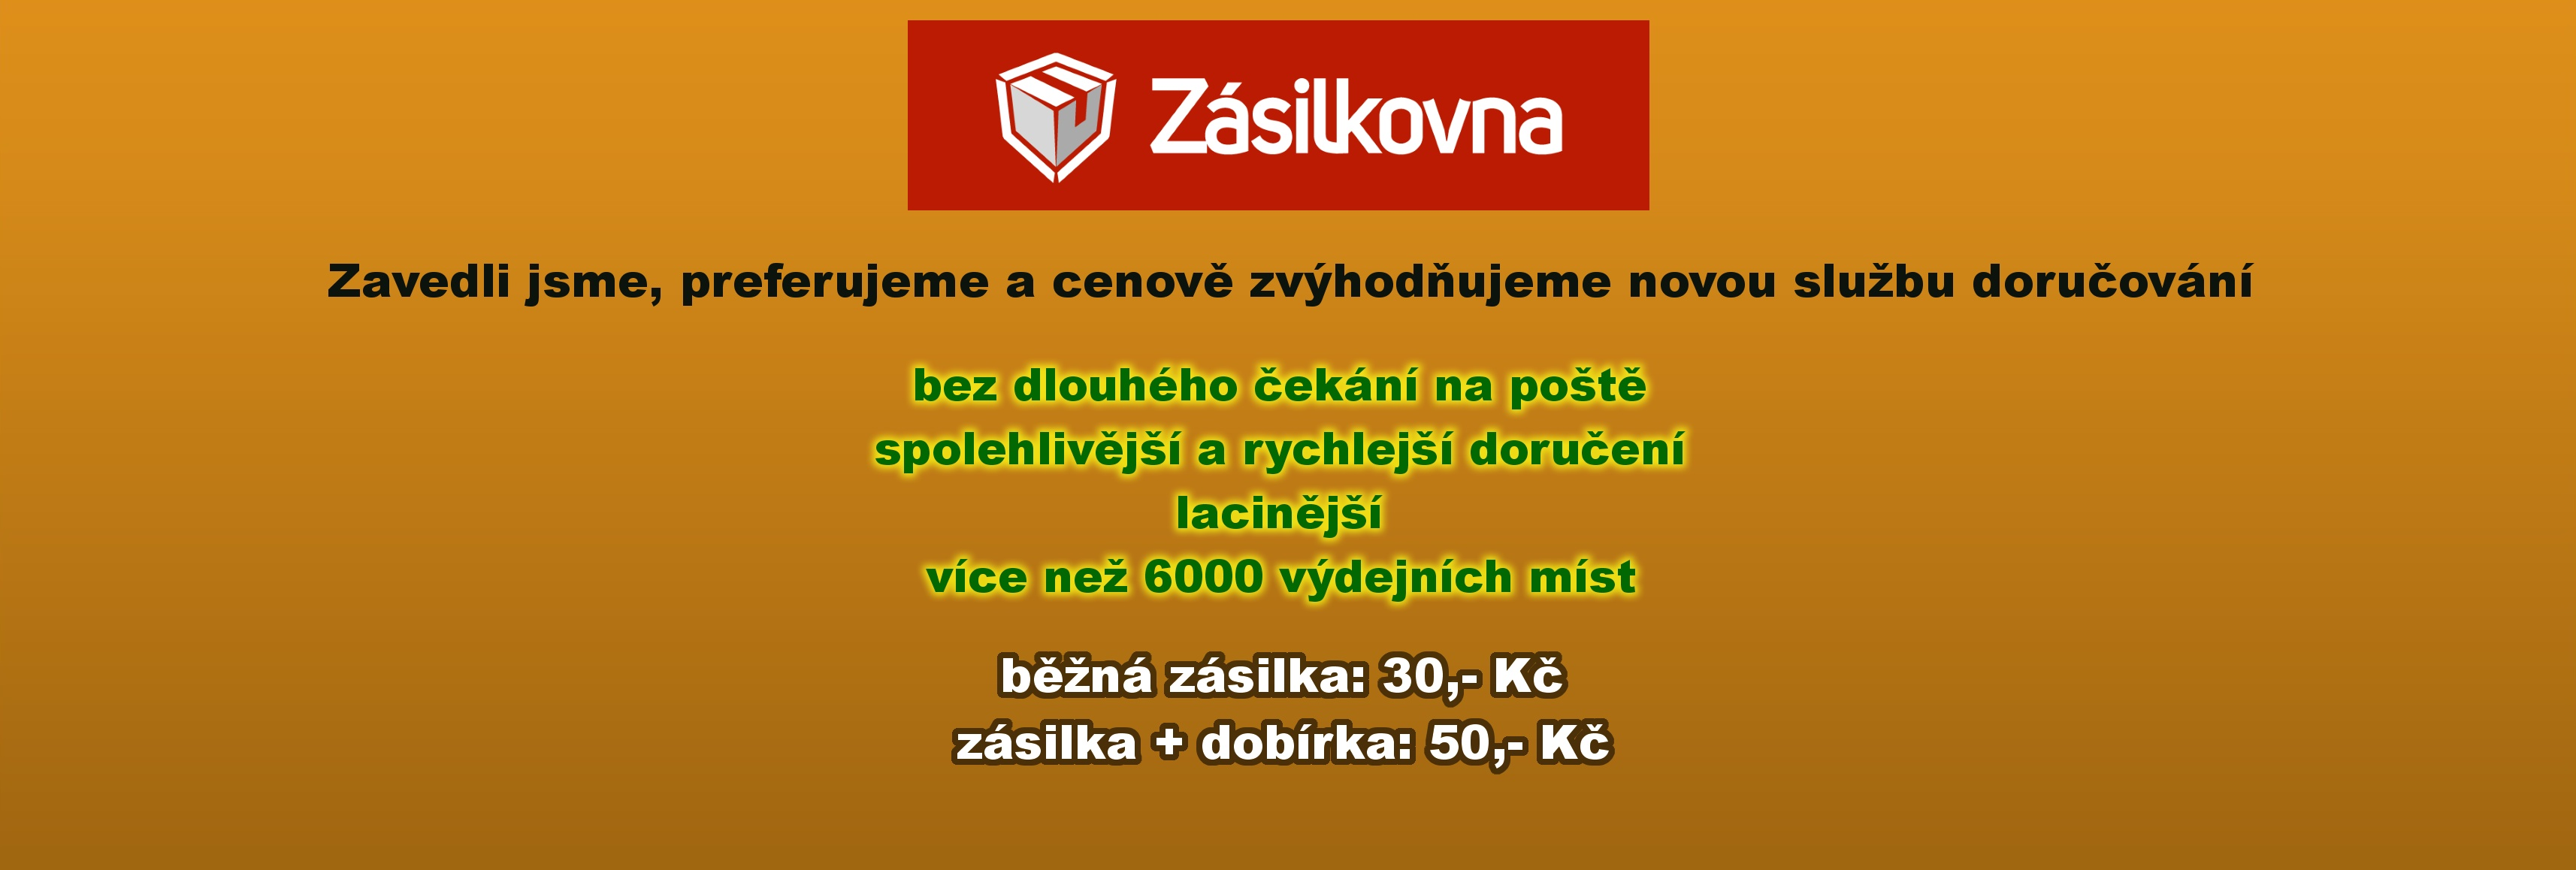 zsilkovna-slide1